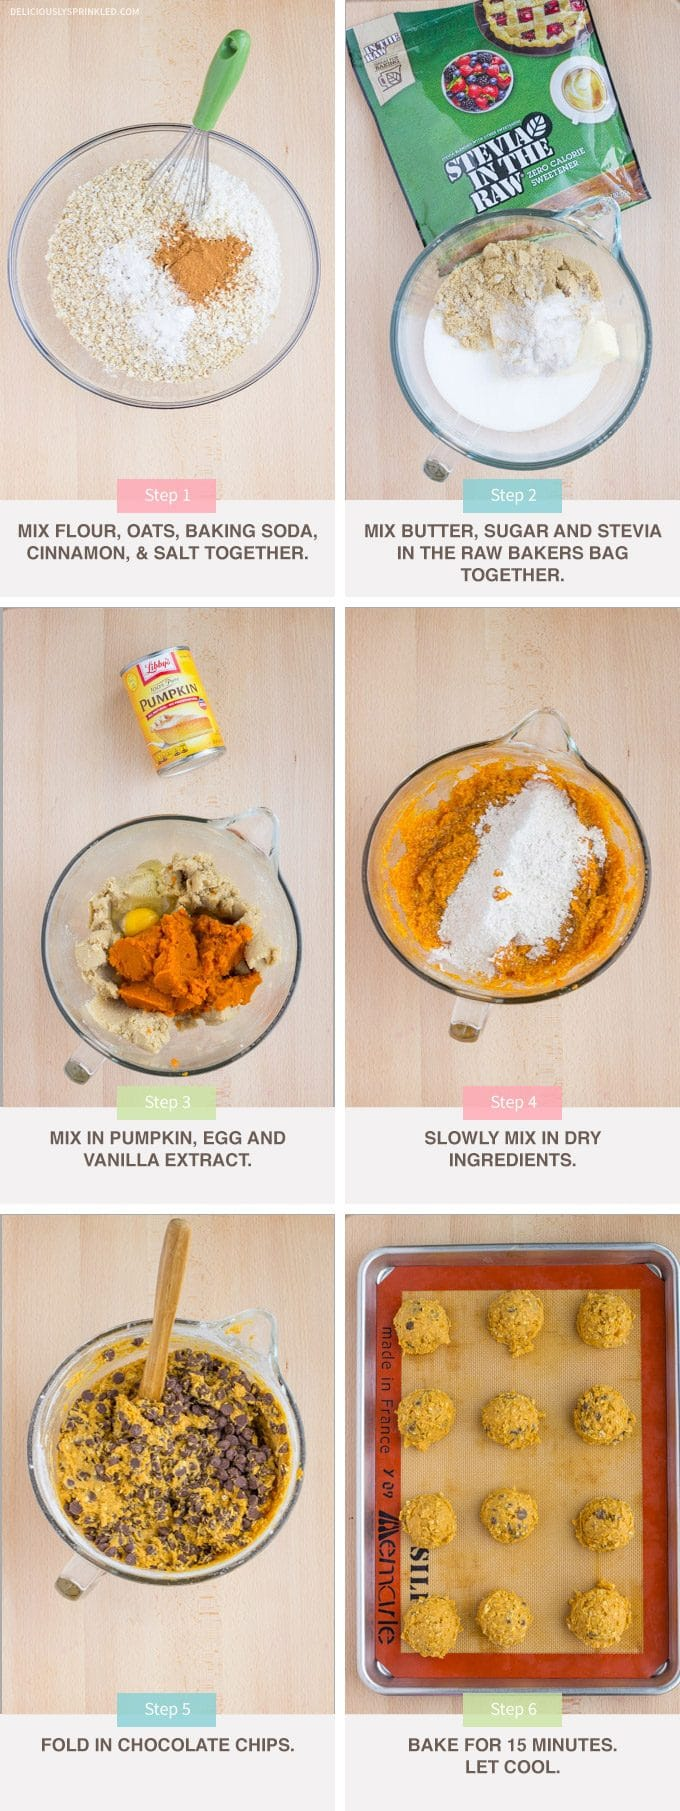 How To Make Pumpkin Chocolate Chip Cookies